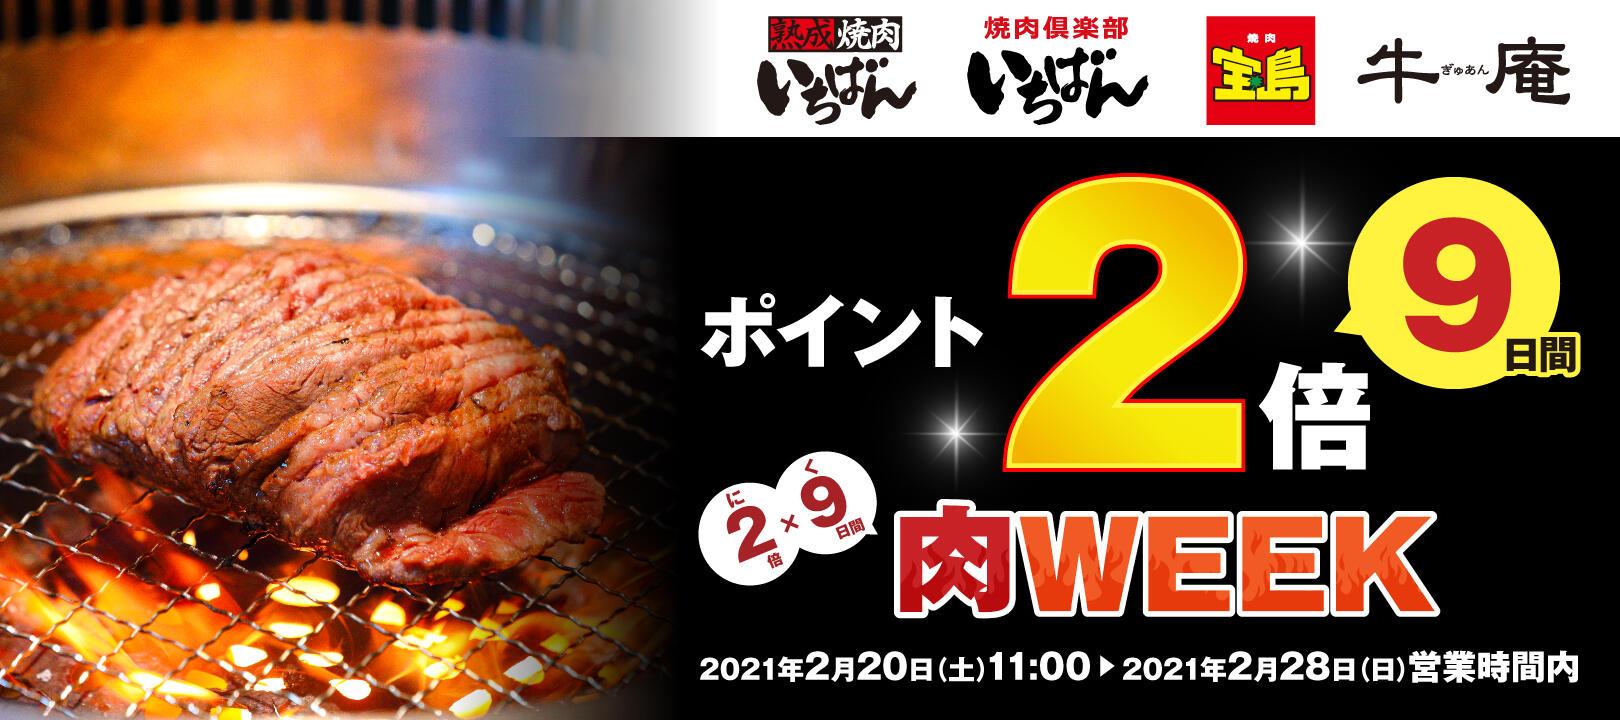 dポイント2倍の9日間 肉WEEK!<br>2021年2月20日(土)11:00から2021年2月28日(日)営業時間内